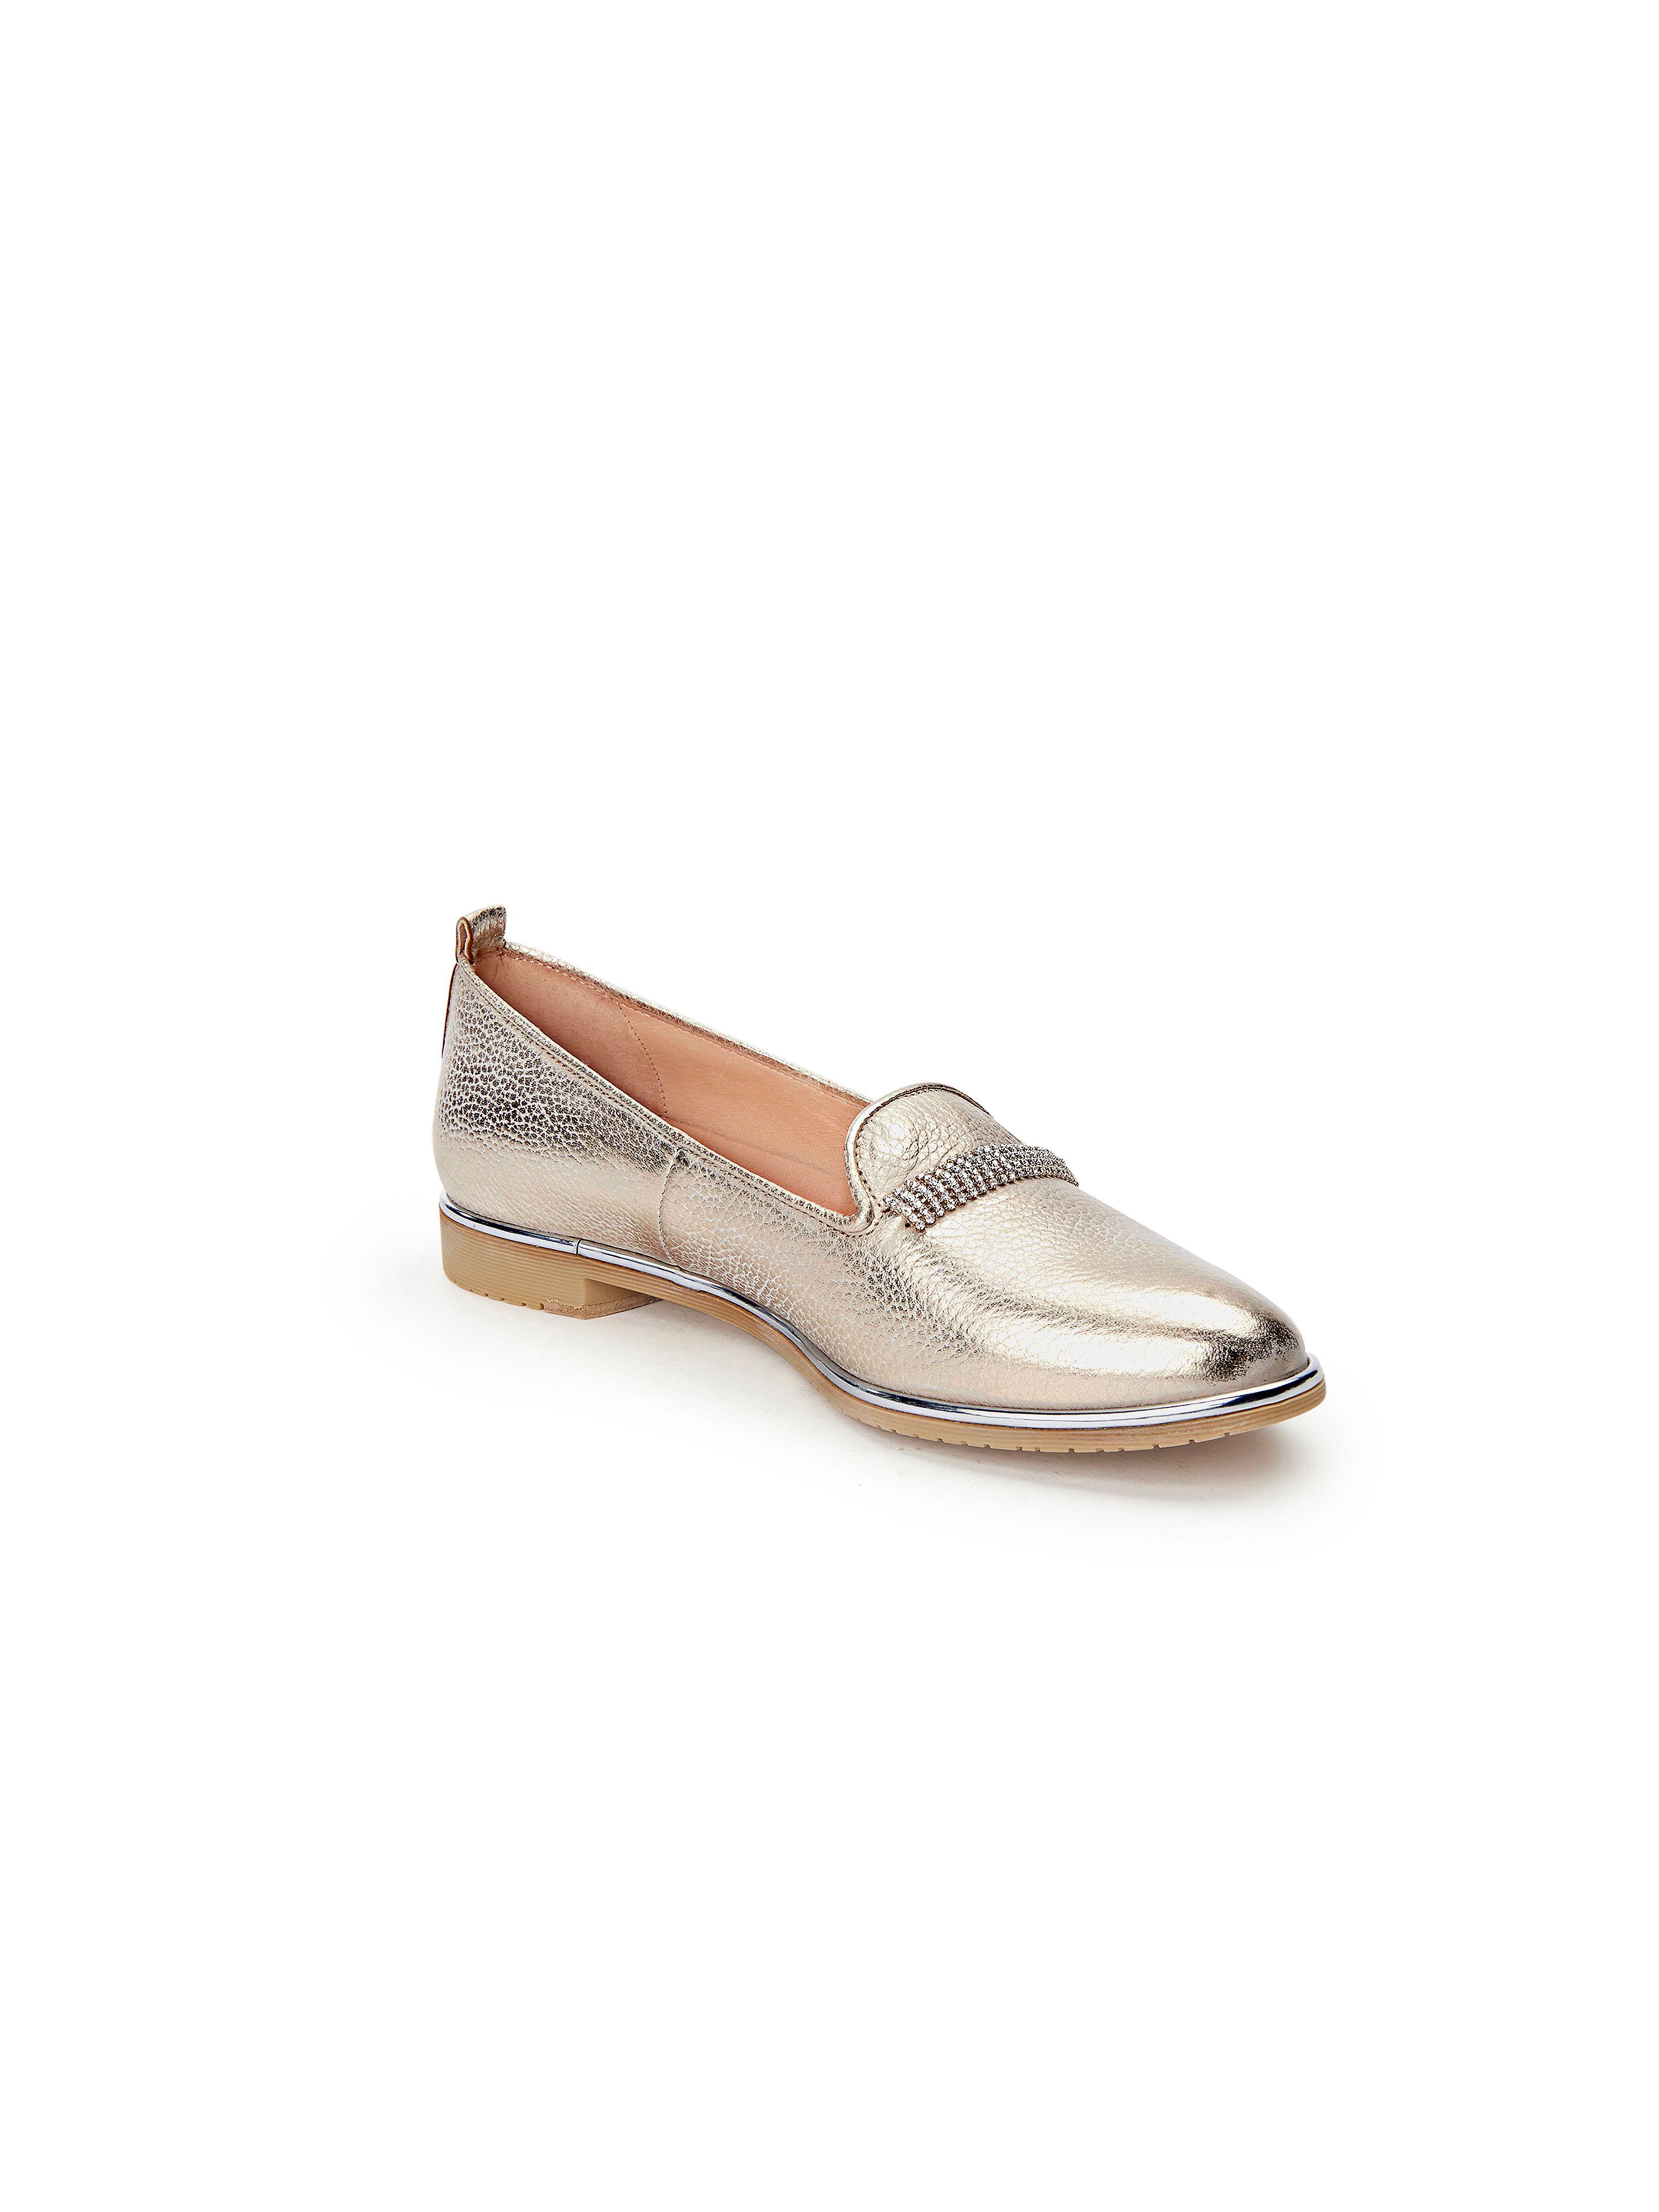 Softwaves - Slipper Qualität aus 100% Leder - Lightgold Gute Qualität Slipper beliebte Schuhe 77406f